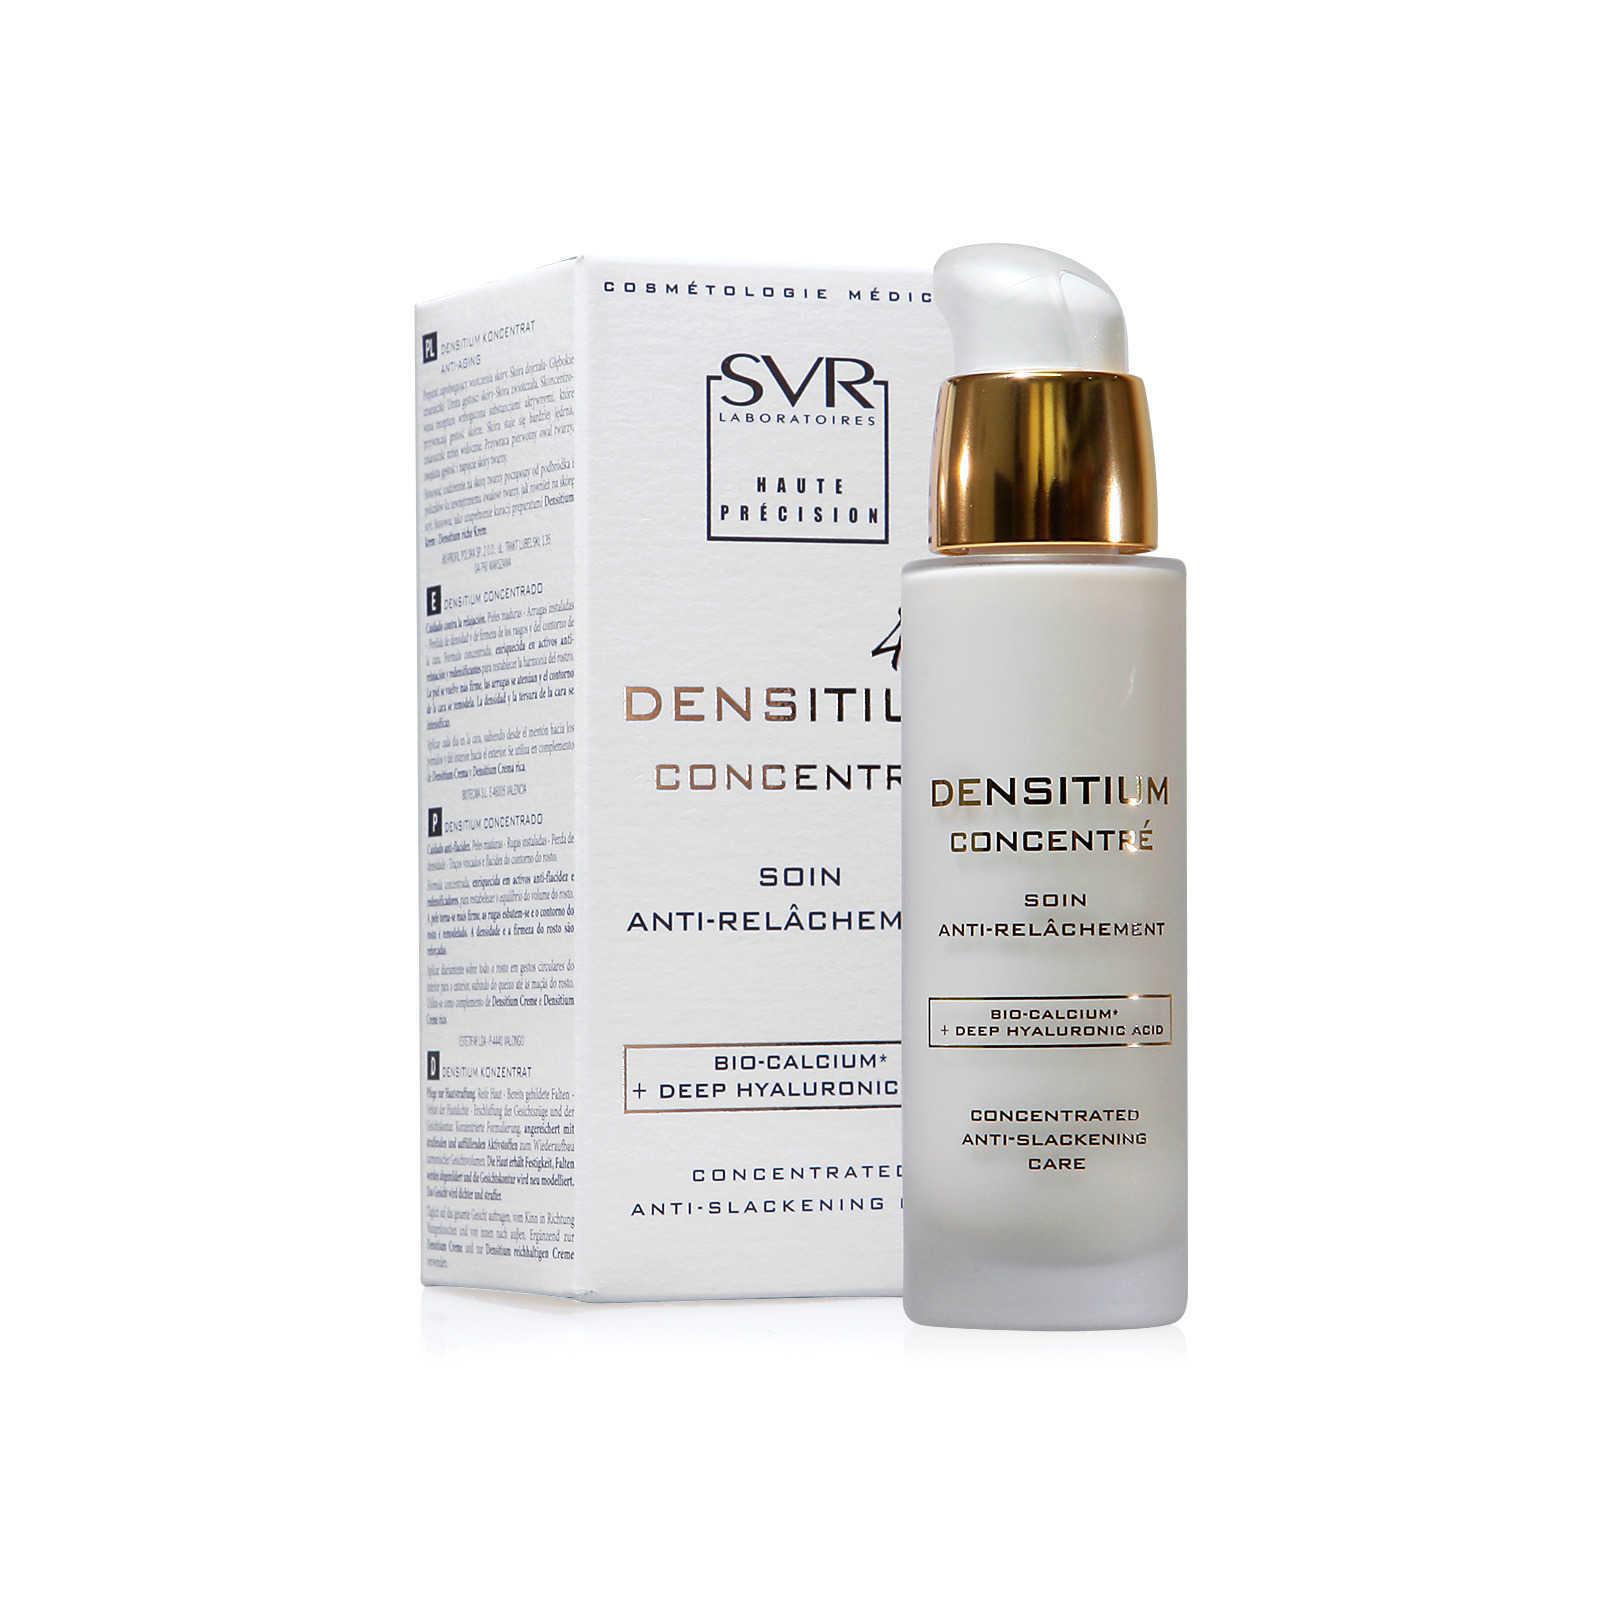 Svr - Crema viso anti-rughe - Densitium 45+ - Concentrè